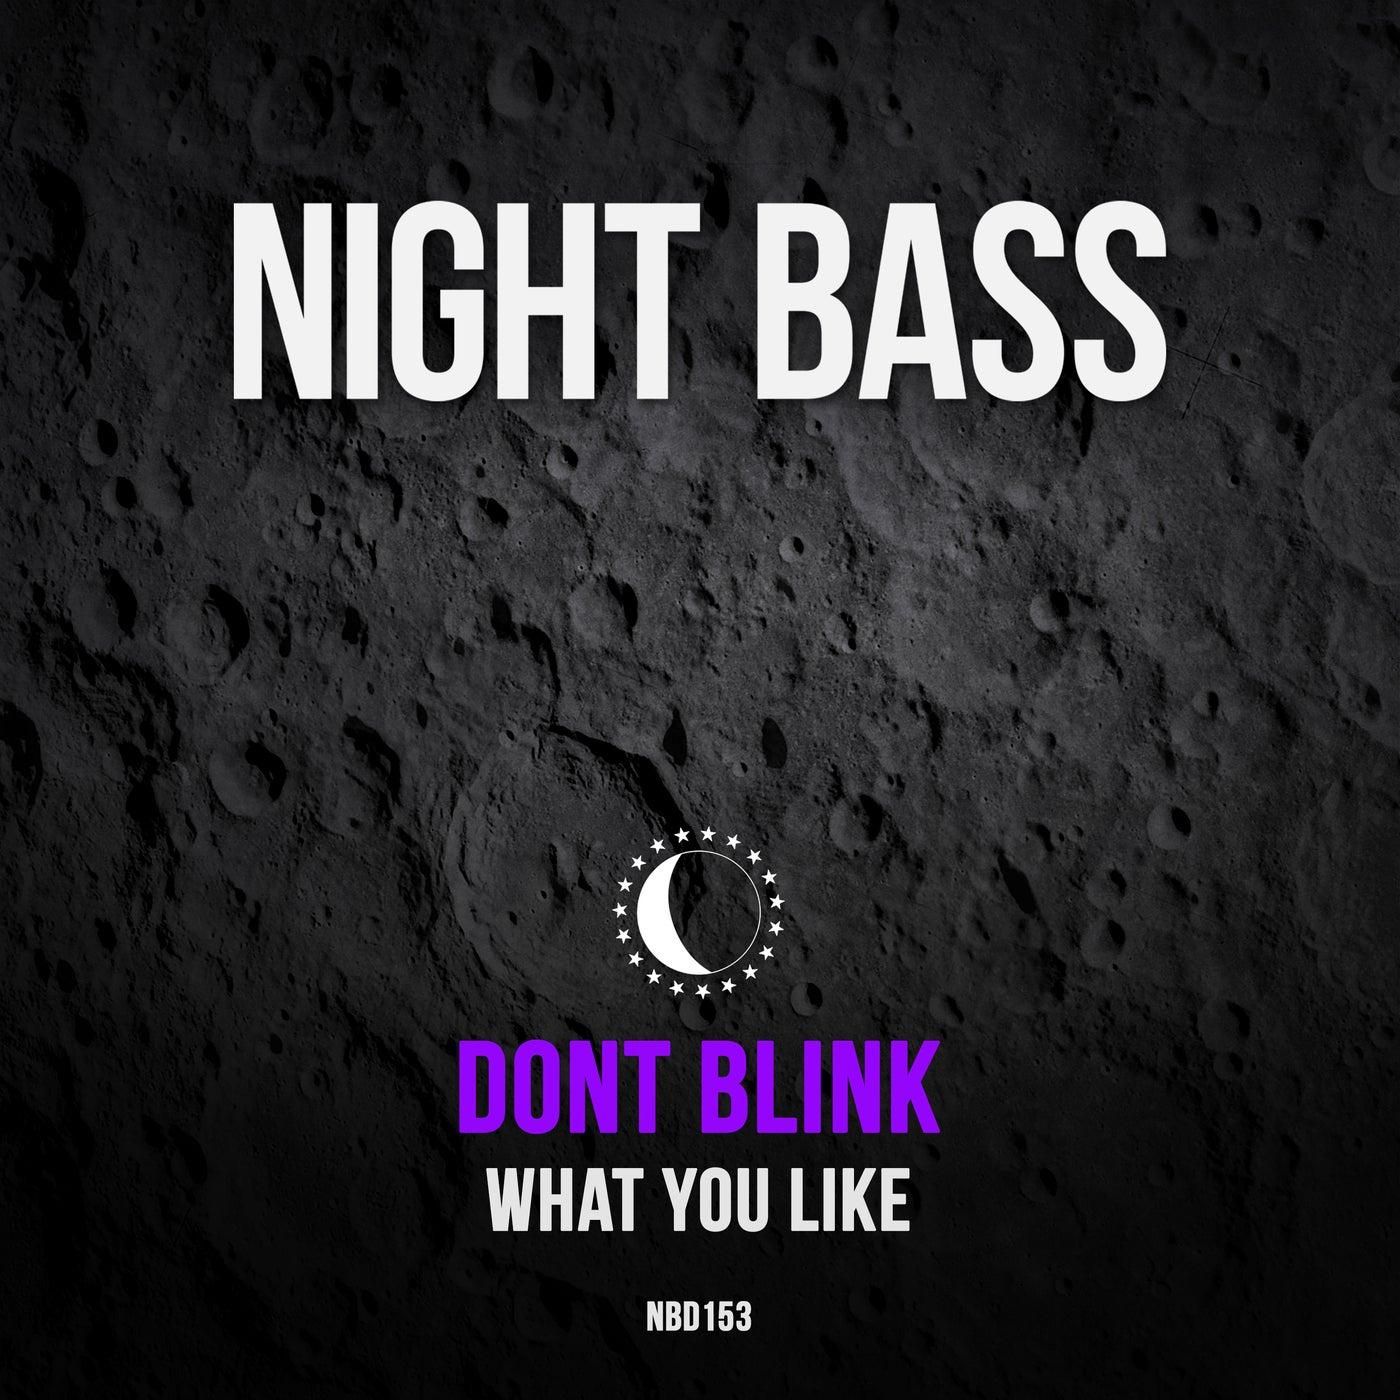 WHAT YOU LIKE (Original Mix)